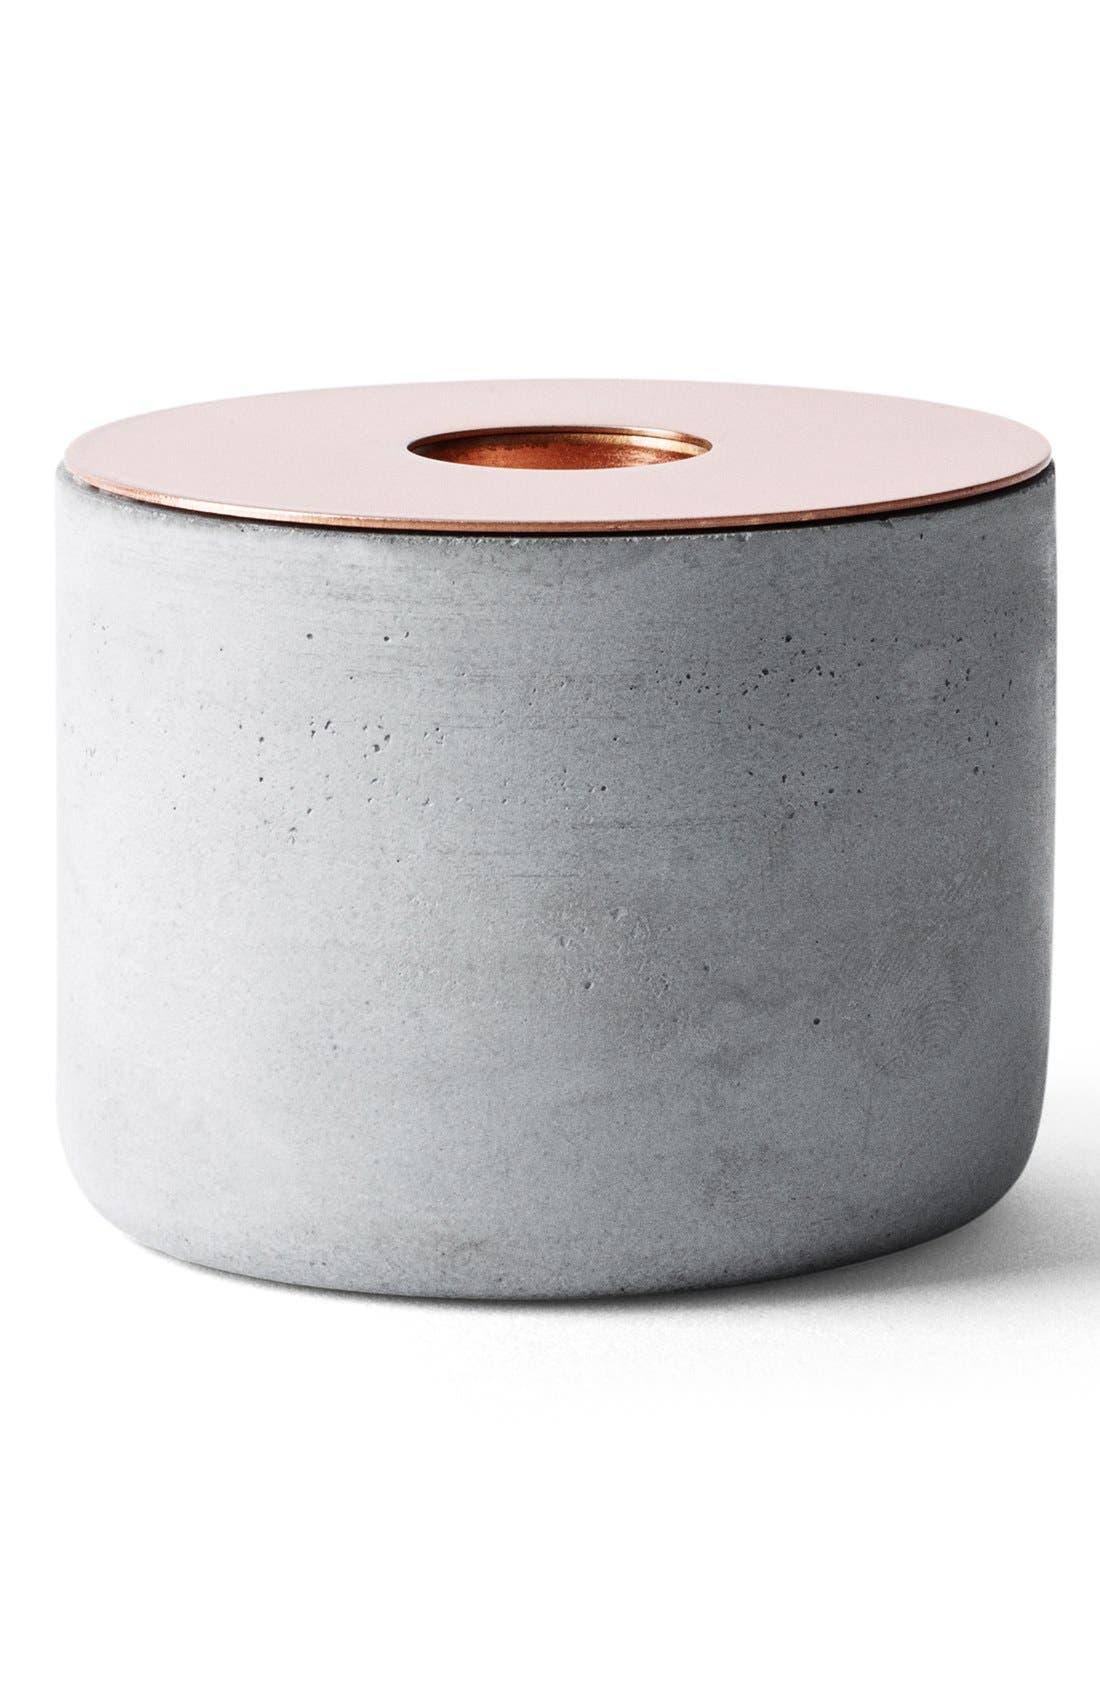 Main Image - MENU 'Chunk of Concrete' Candlestick Holder